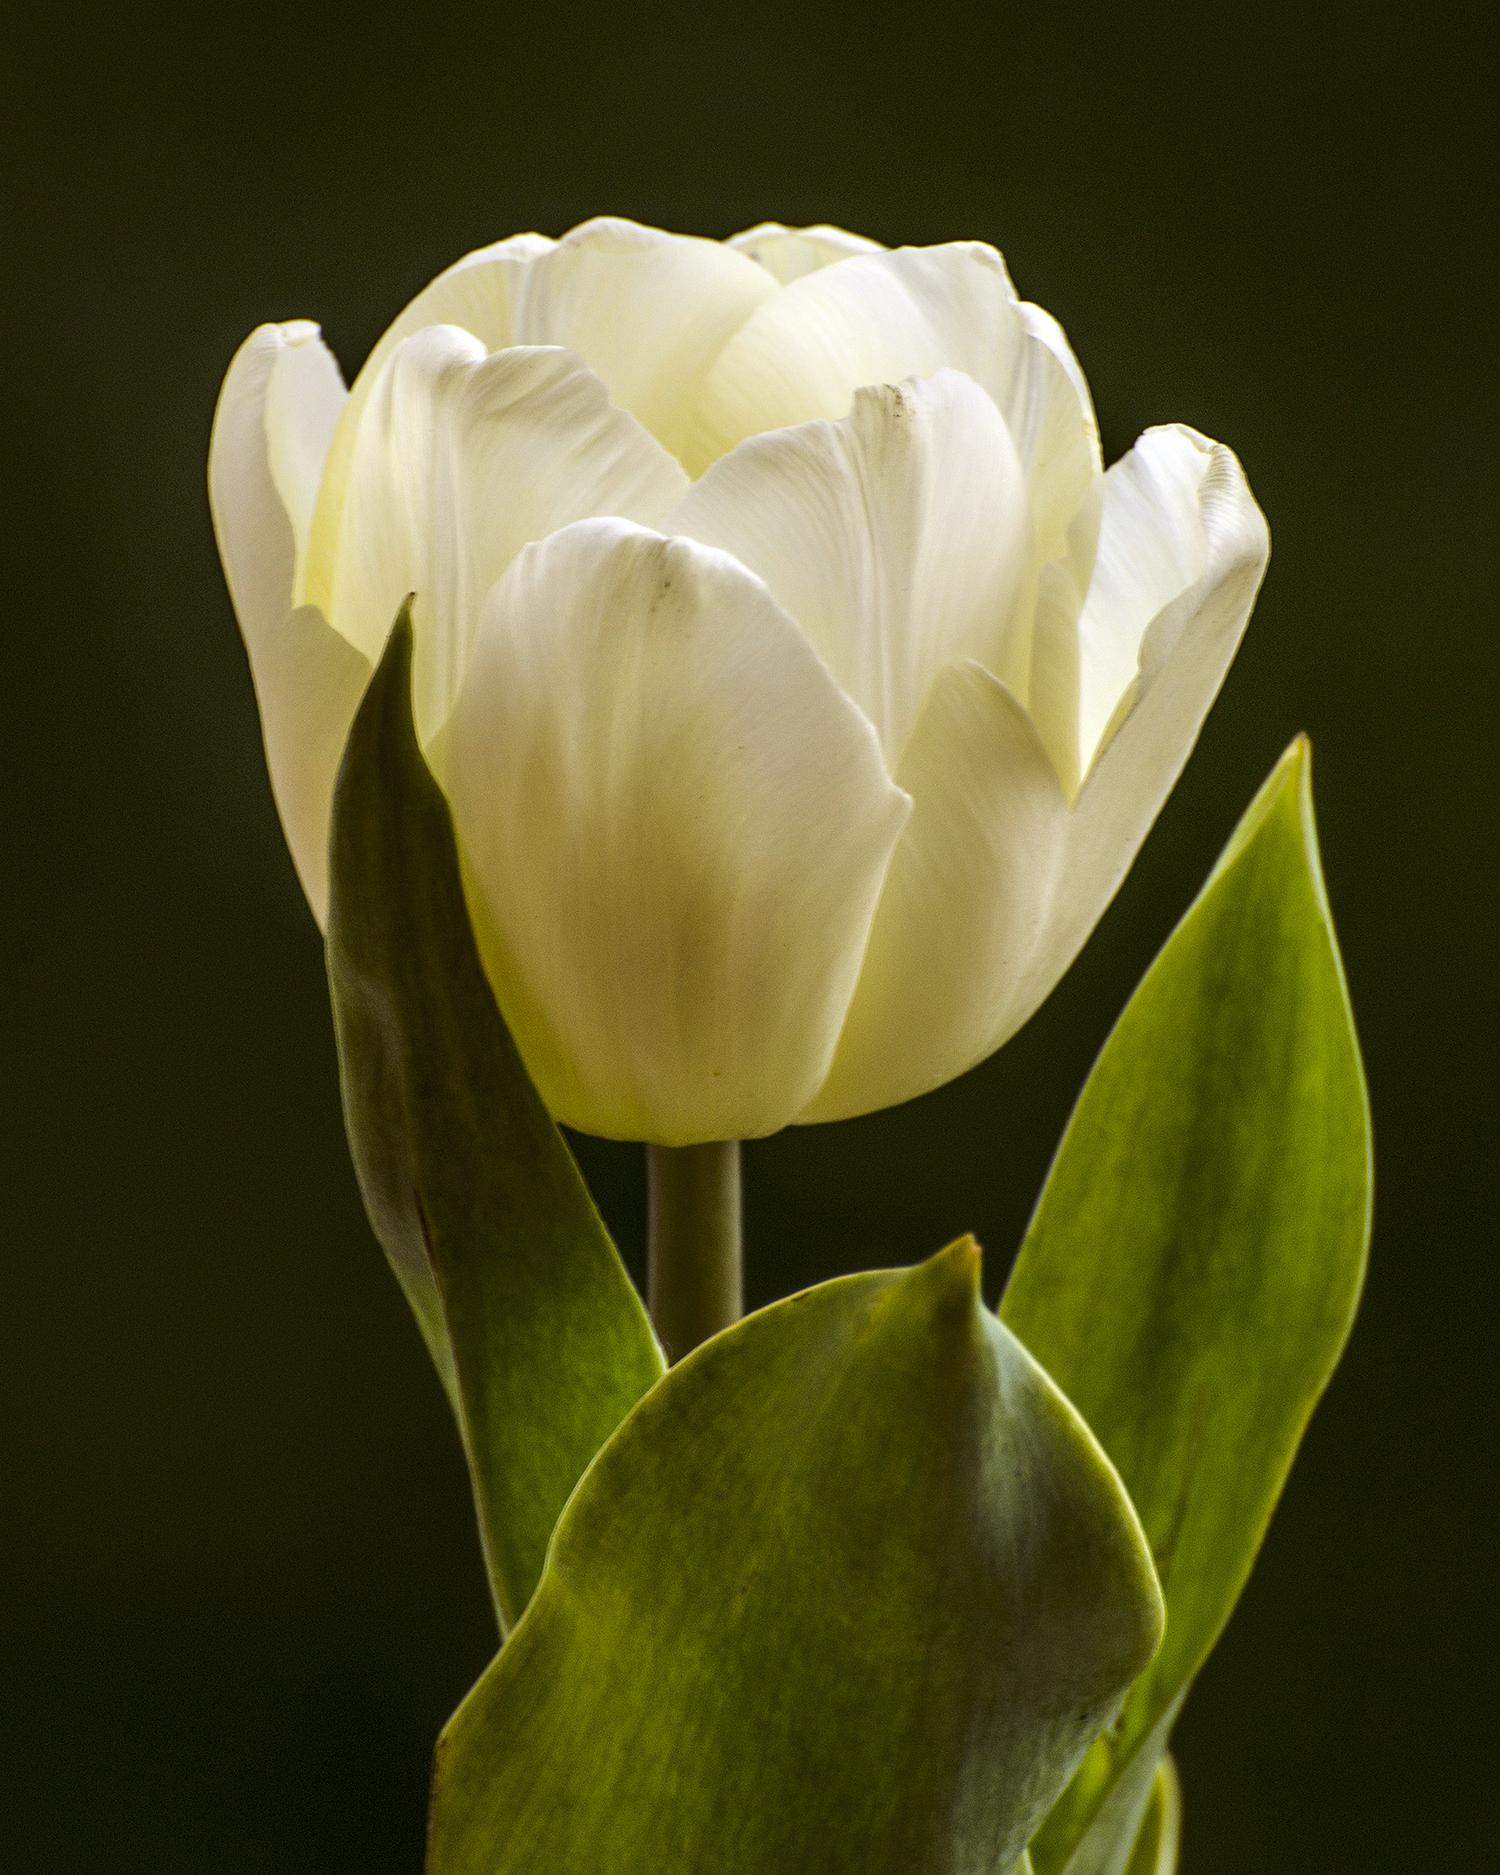 white white tulips 7672.jpg